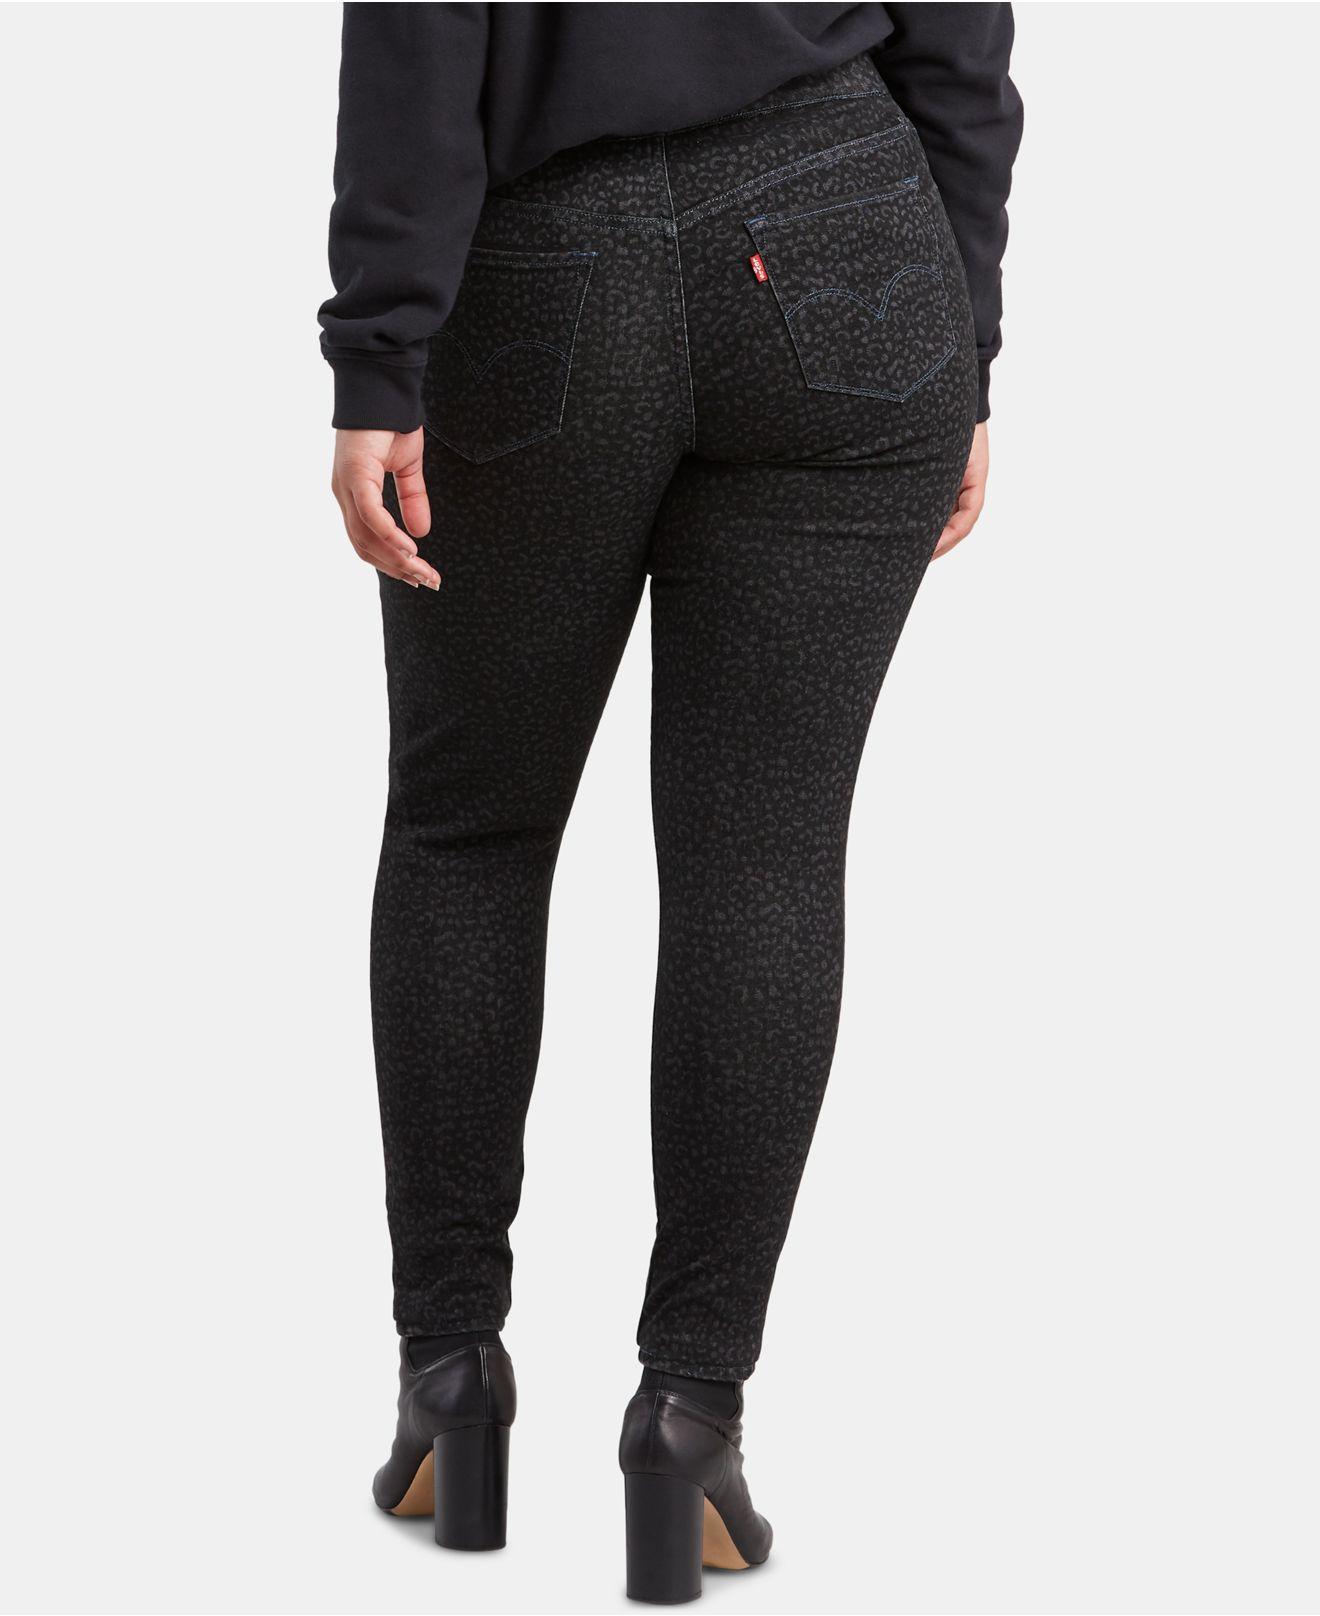 b638cb321f6f0 Lyst - Levi's ® Trendy Plus Size Jeggings in Black